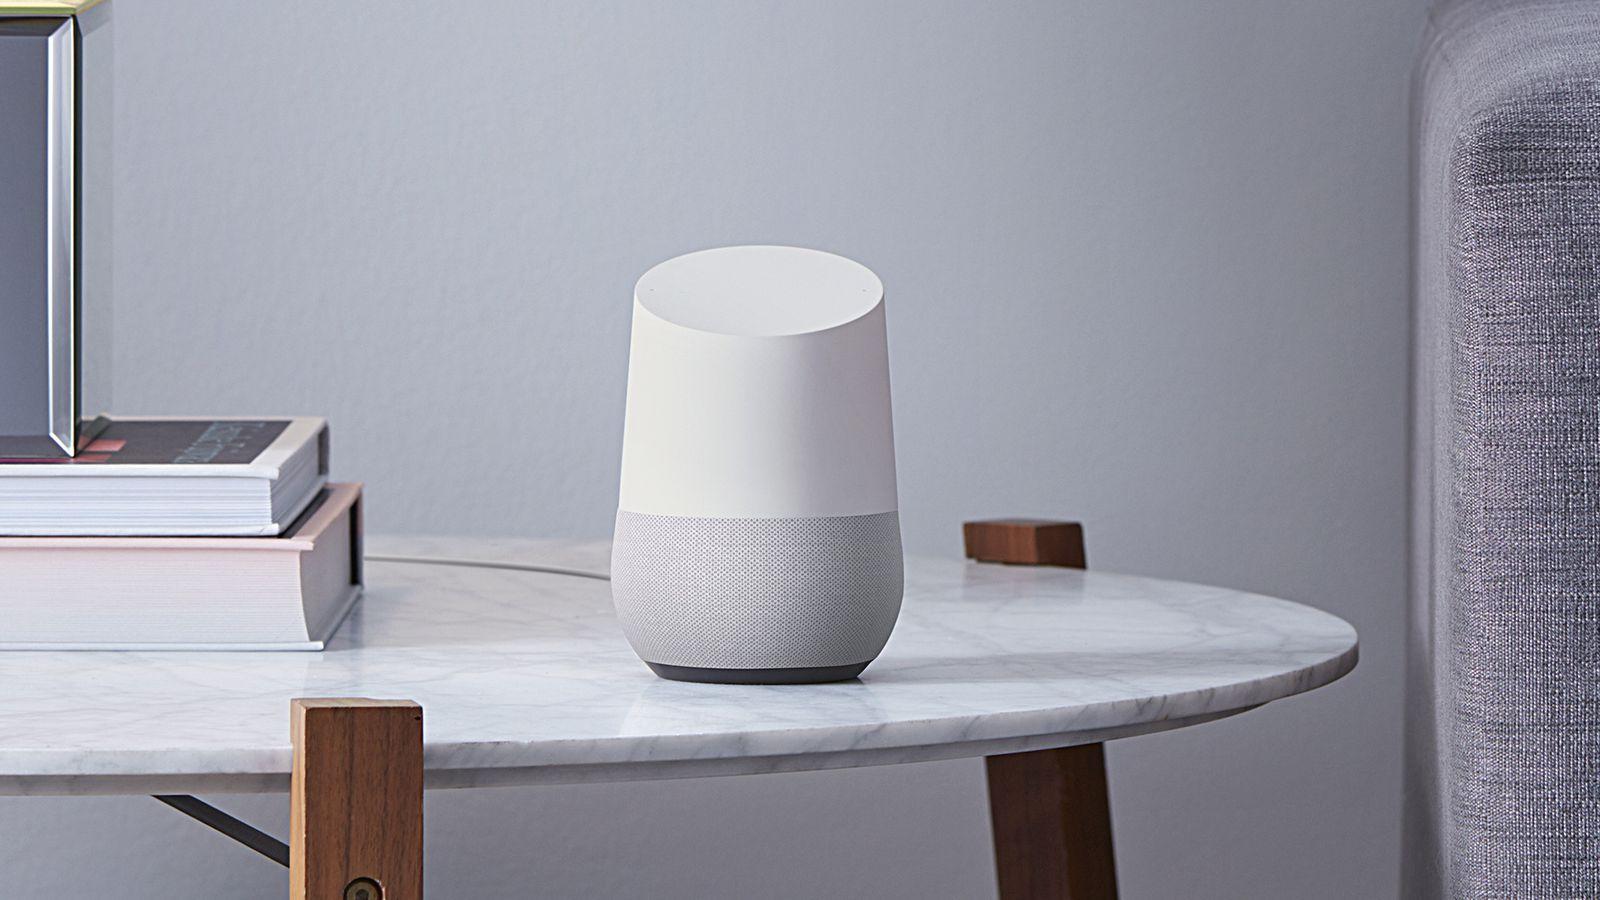 گوگل هوم اسپیکر هوشمند